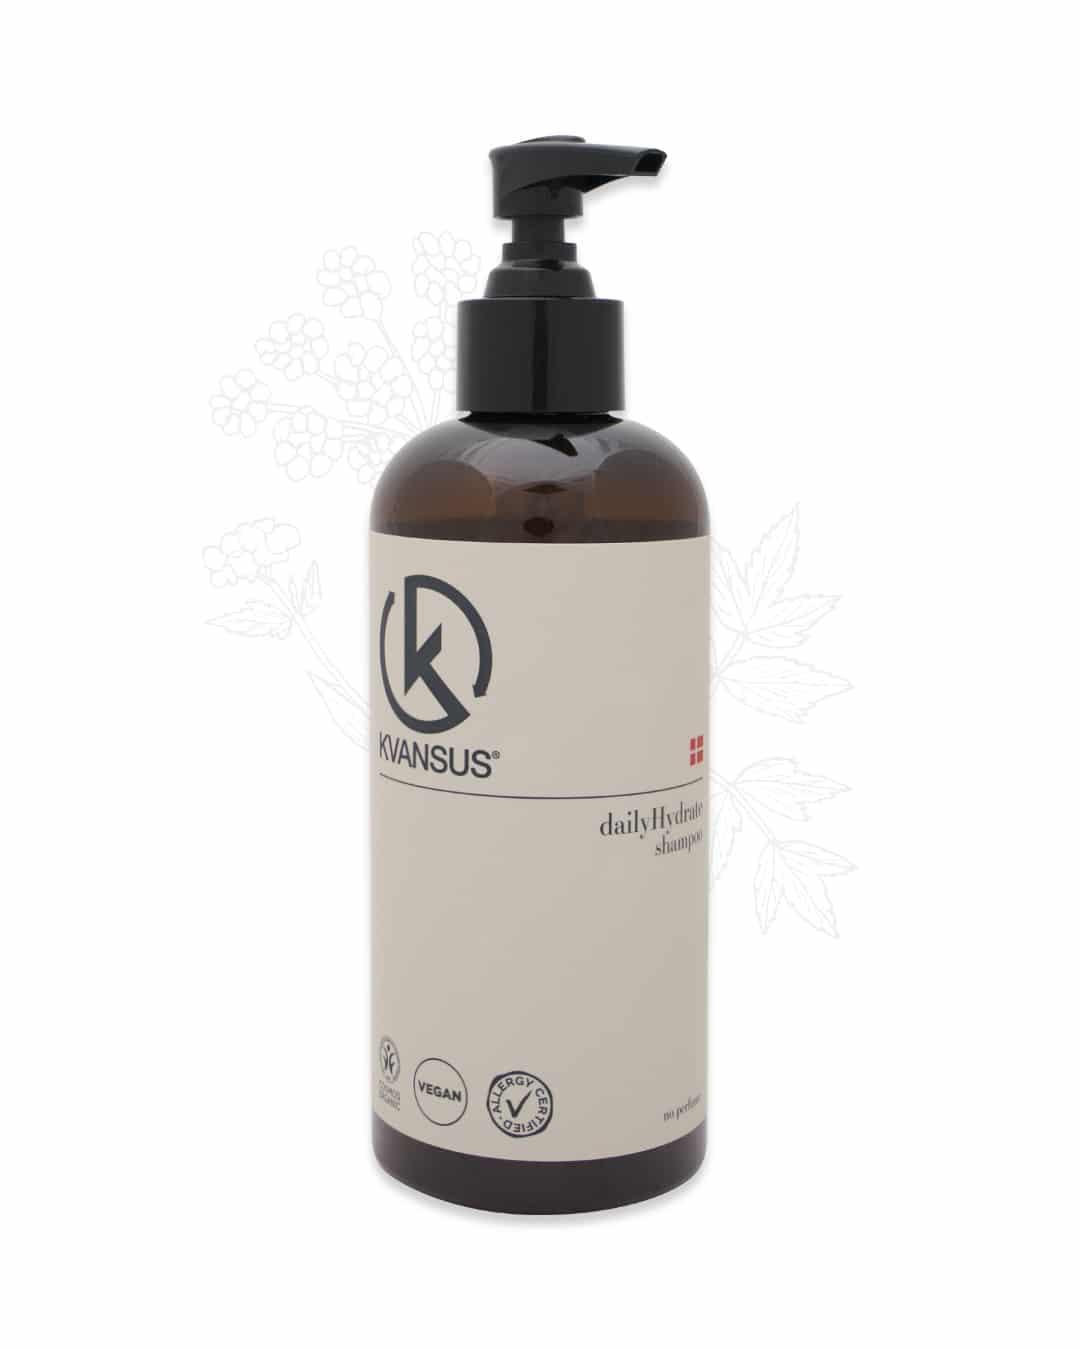 dailyHydrate shampoo 1